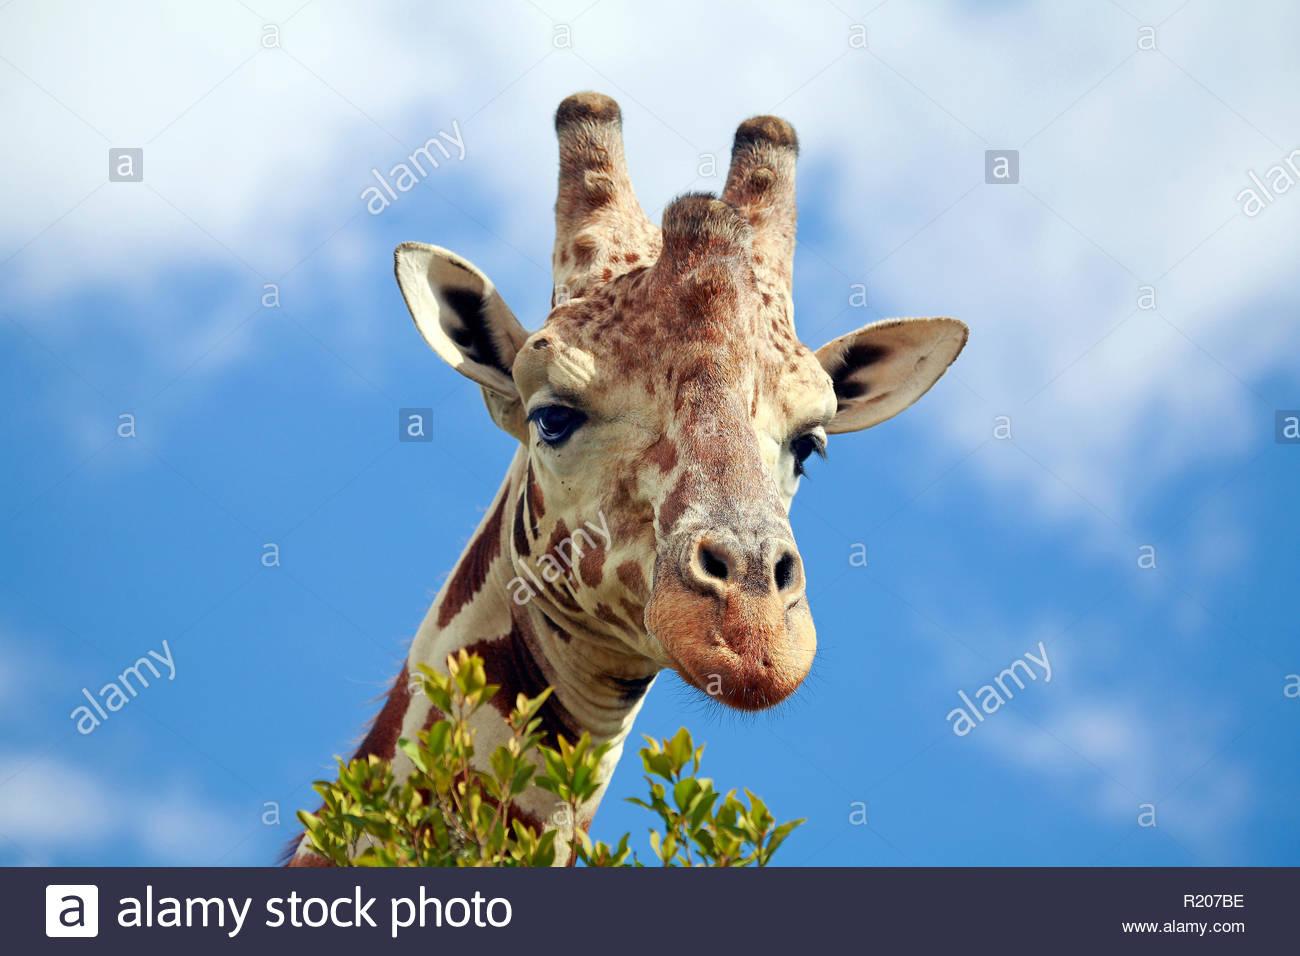 Giraffe (Giraffa camelopardalis), Porträt, Mweiga Region, Kenia, Afrika | Giraffe (Giraffa camelopardalis), portrait, Mweiga area, Kenya, Africa - Stock Image